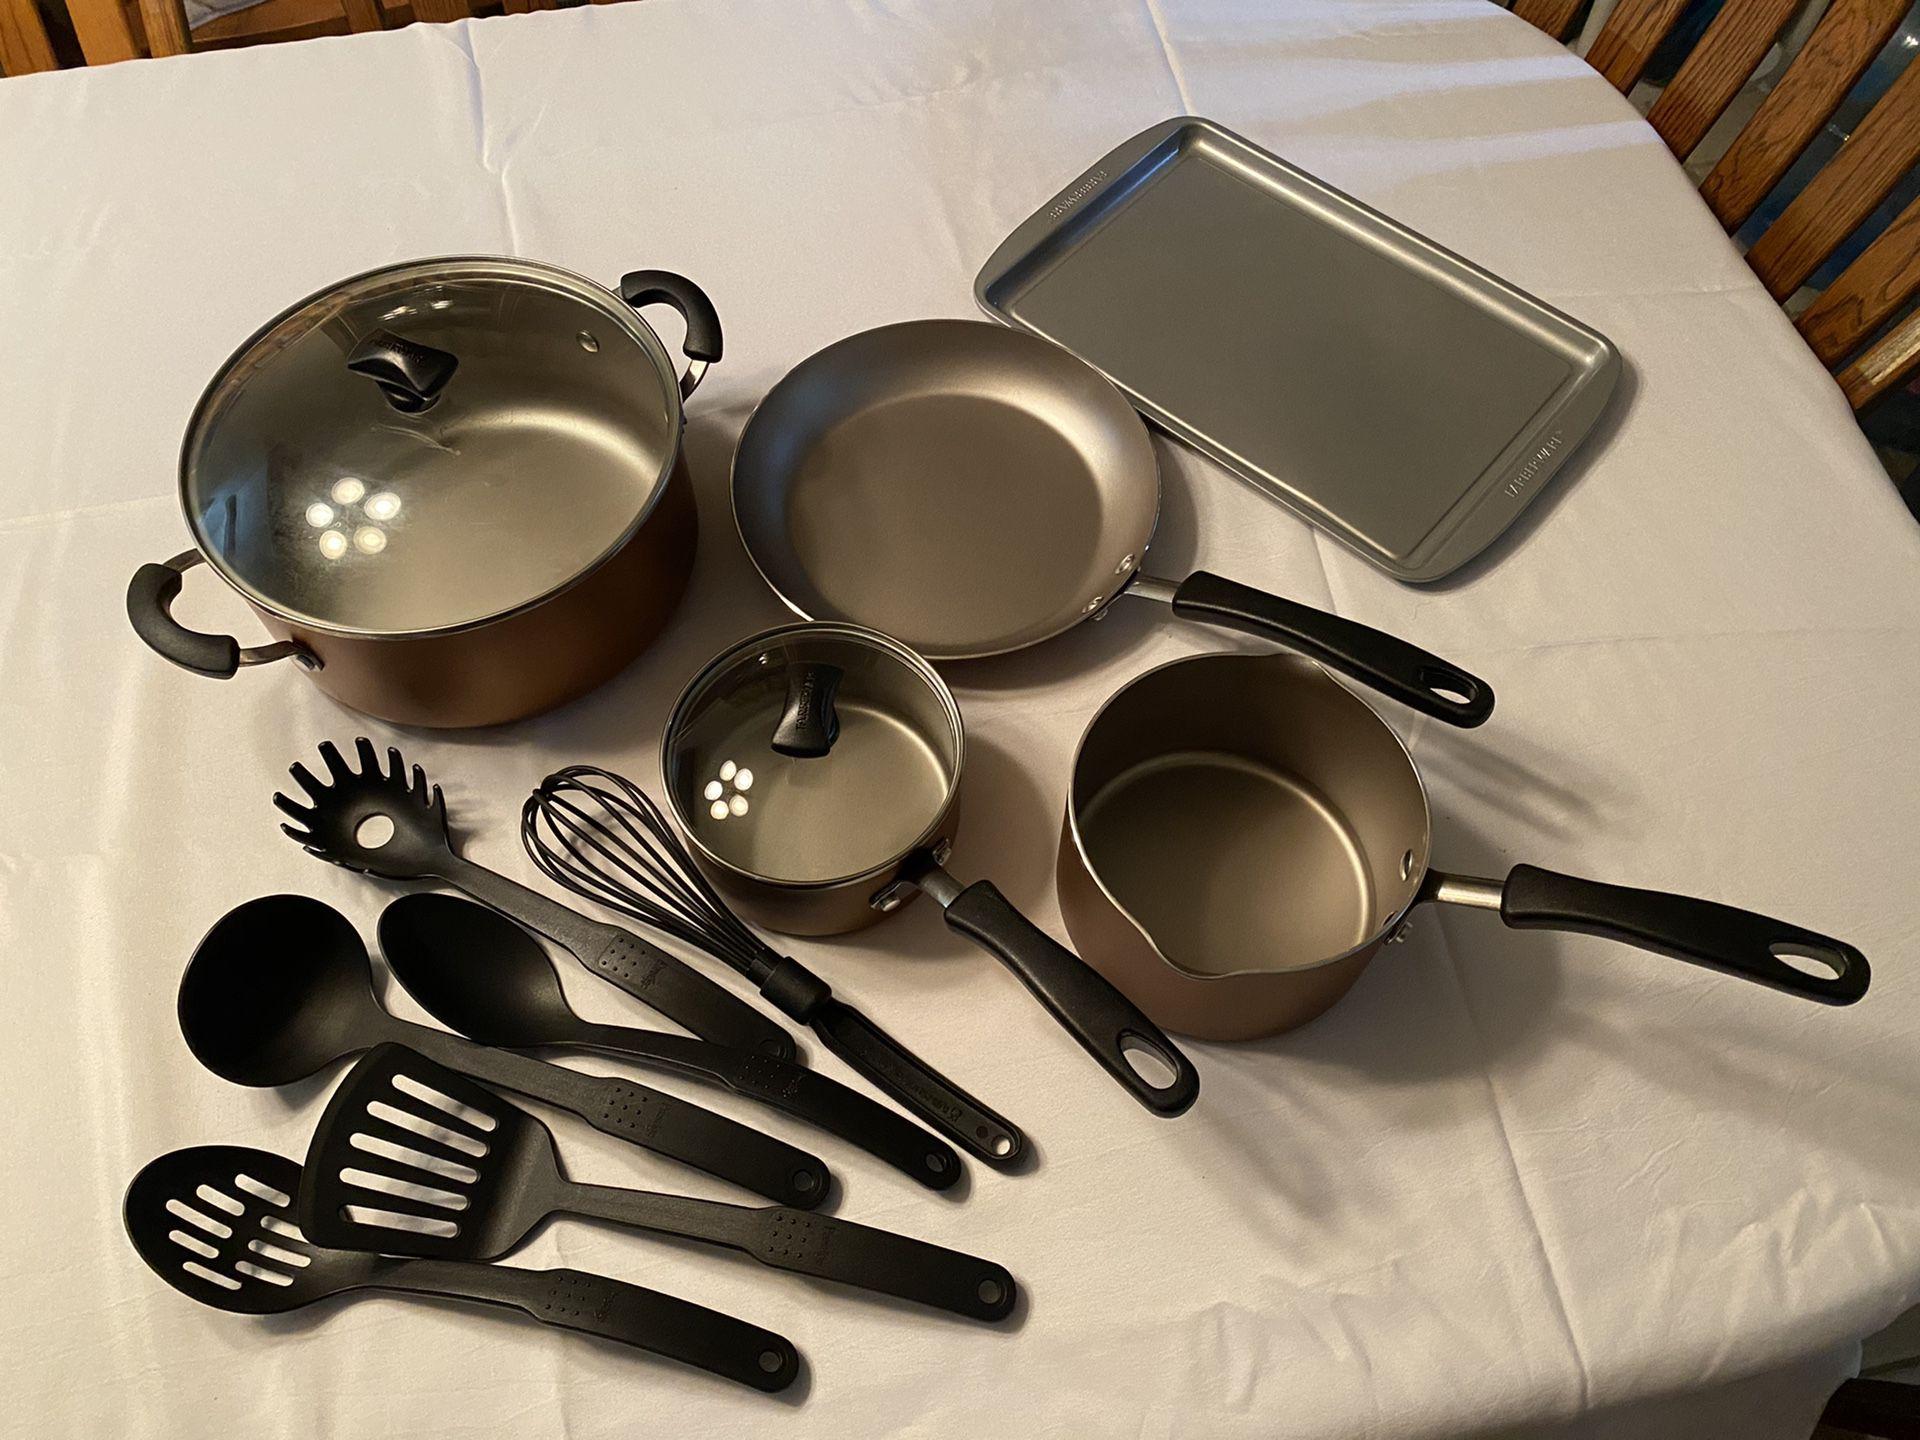 13 Piece Farberware Cookstart DiamondMax NonStick Cookware Set